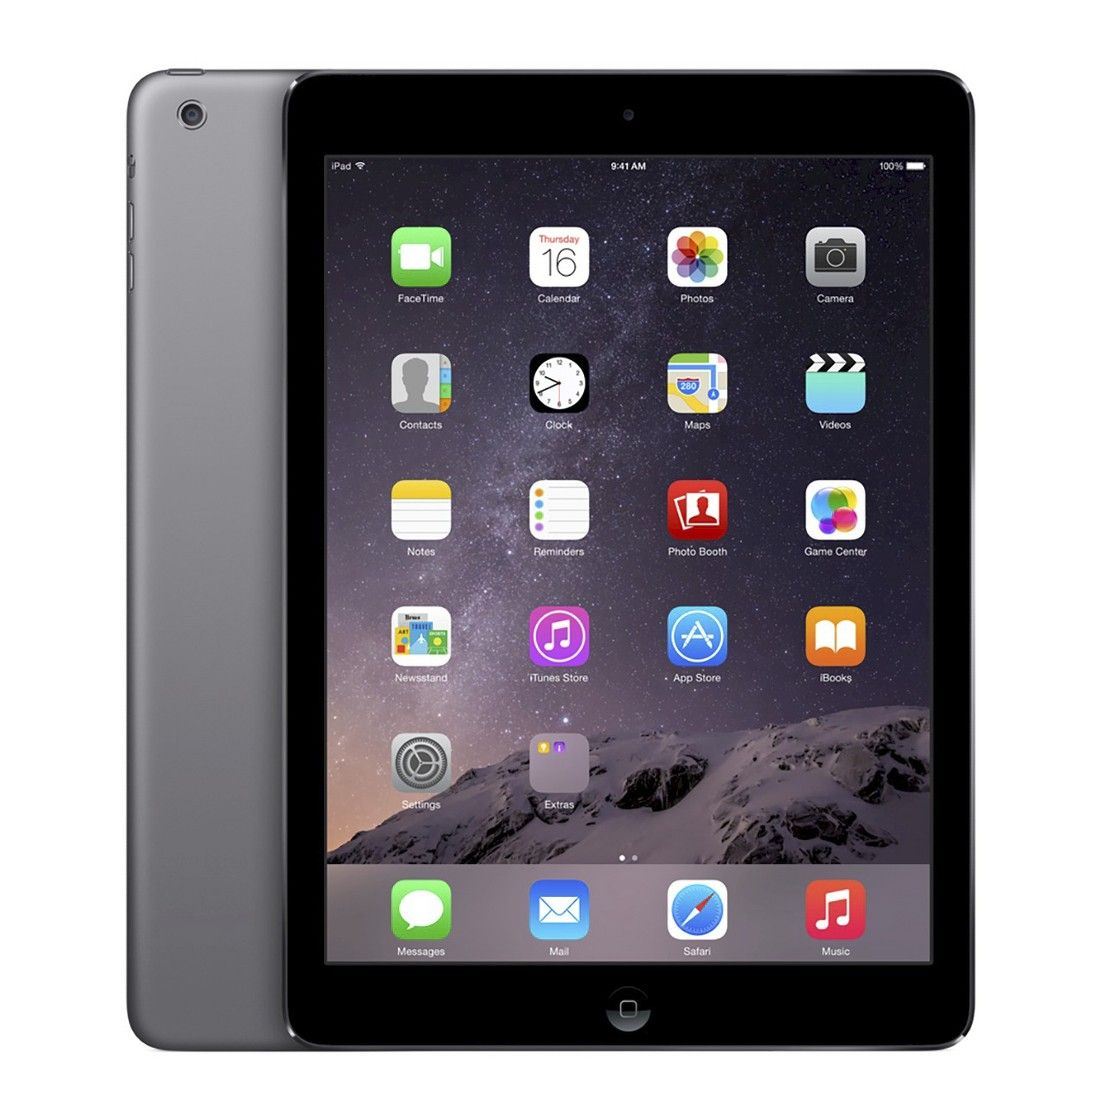 Apple Ipad Air 2 128gb Wi Fi Space Gray Apple Ipad Mini Apple Ipad Air Refurbished Ipad